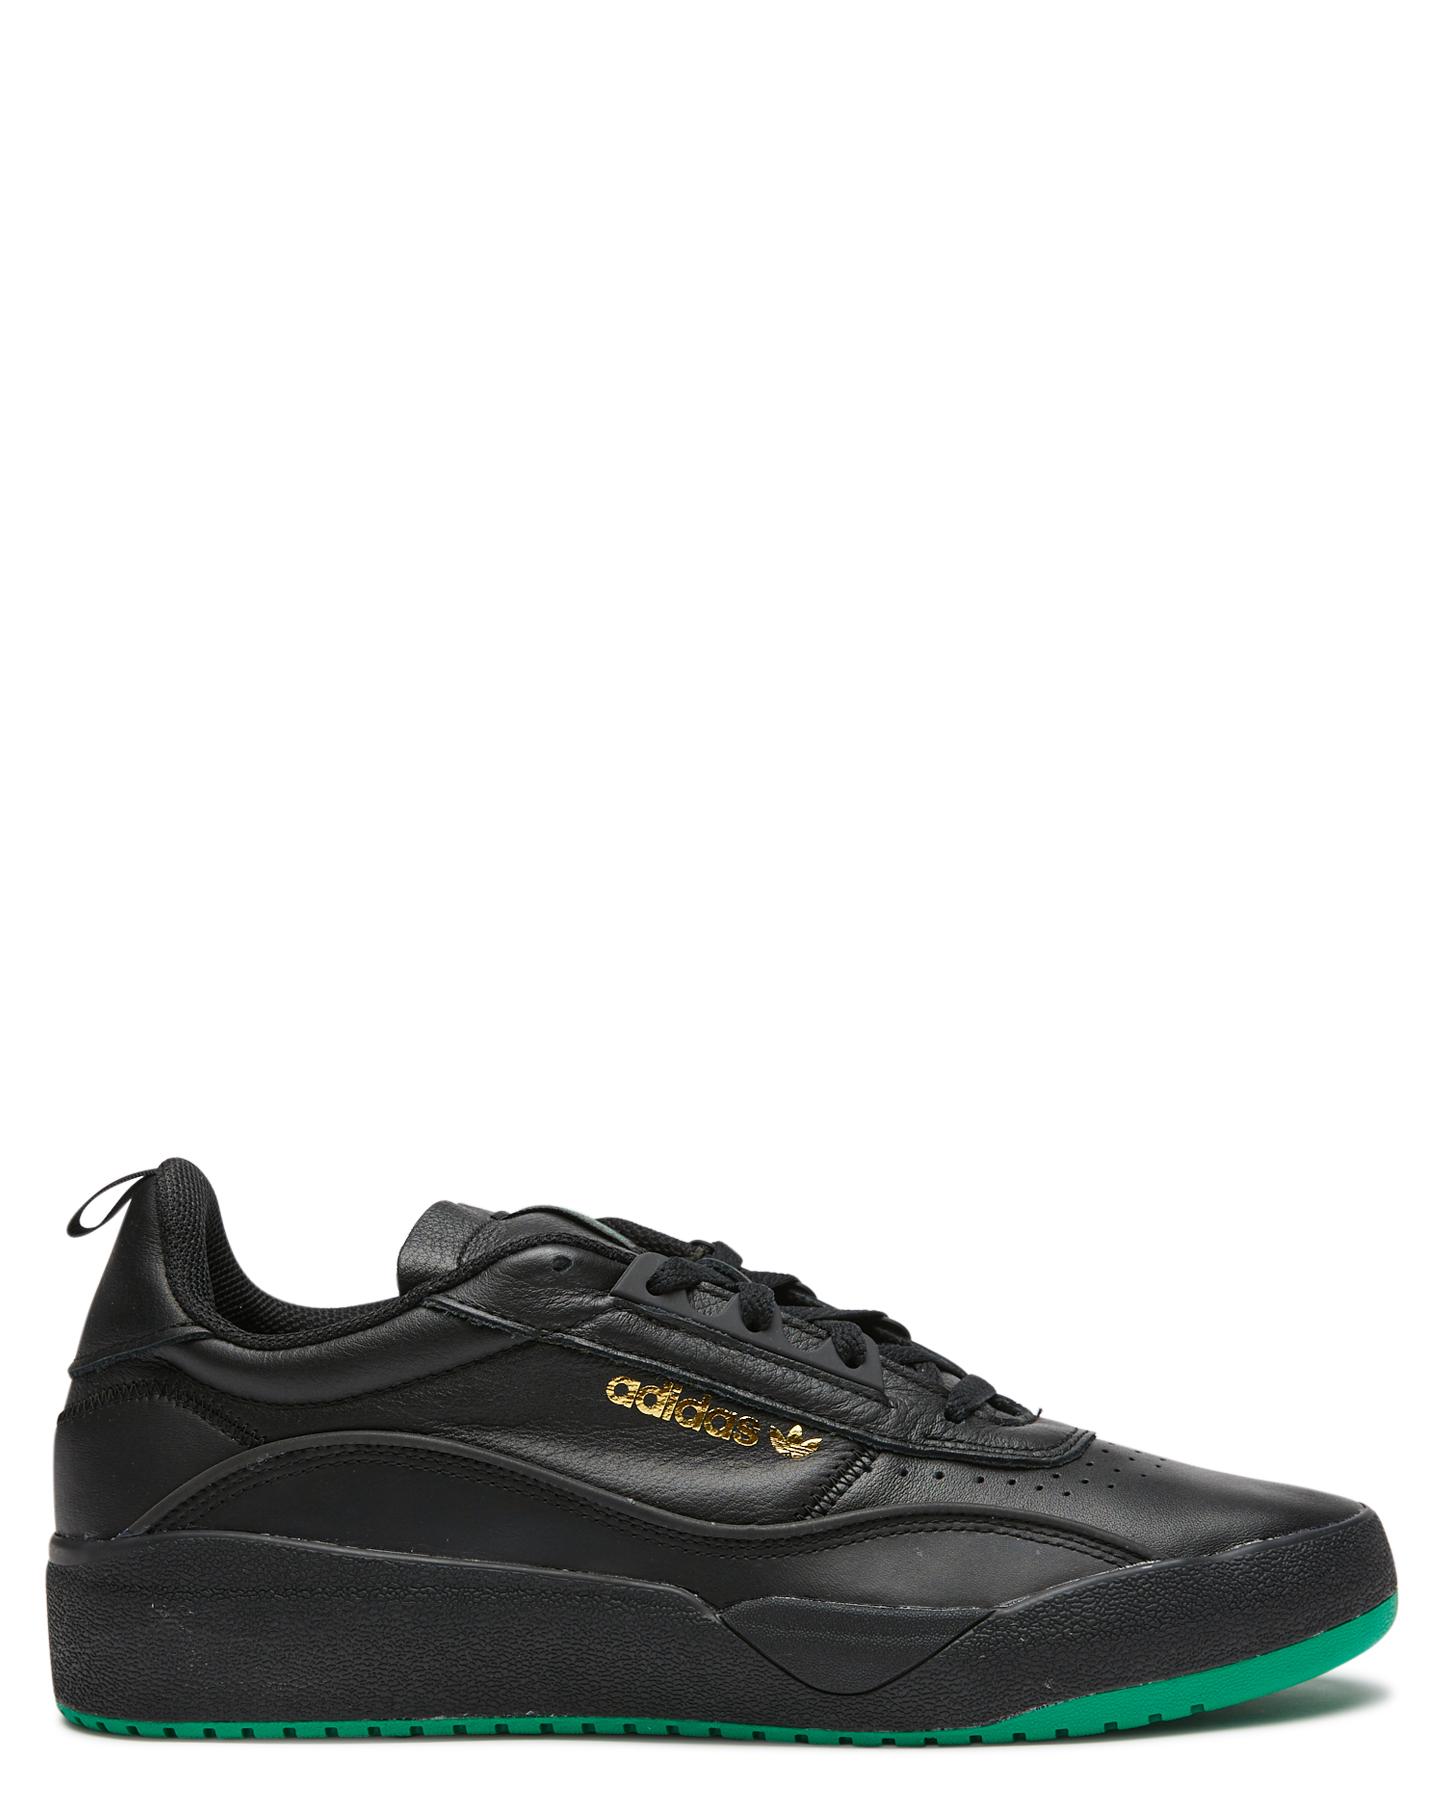 Adidas Mens Liberty Cup Shoe - Core